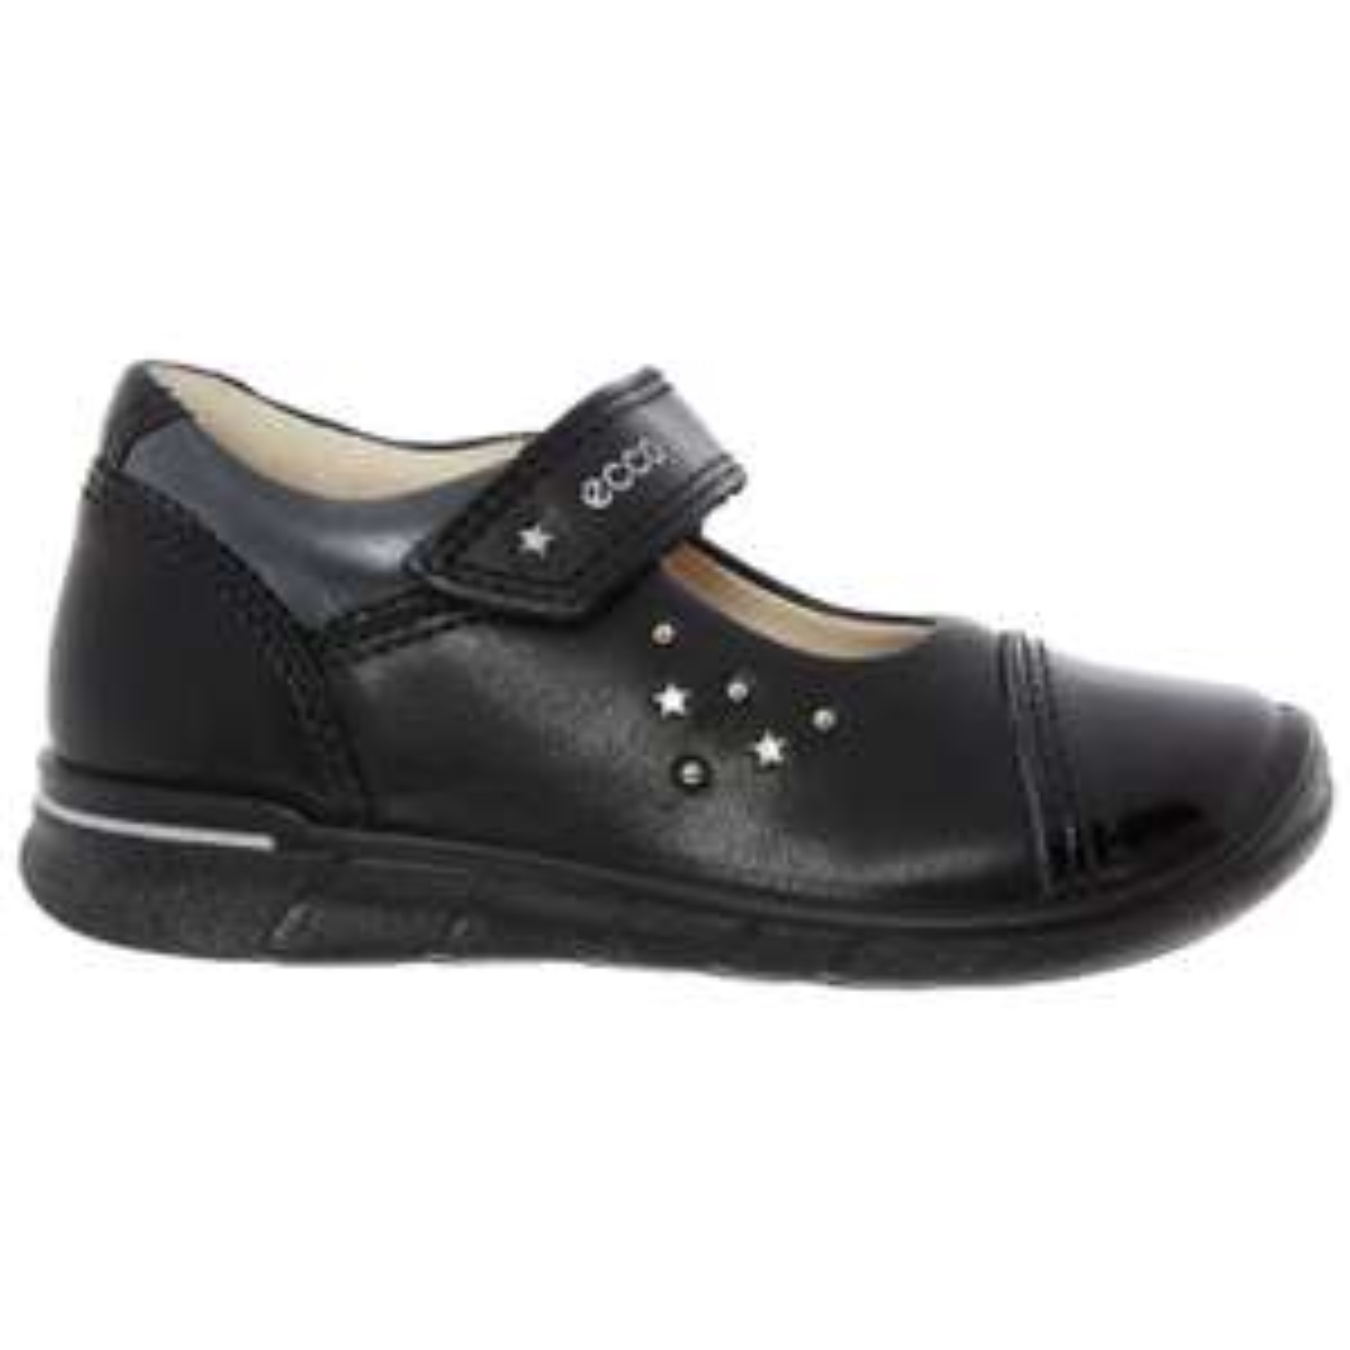 ECCO  Black Leather Star Motif Shoes £12.99 TK Maxx - £1.99 c&c